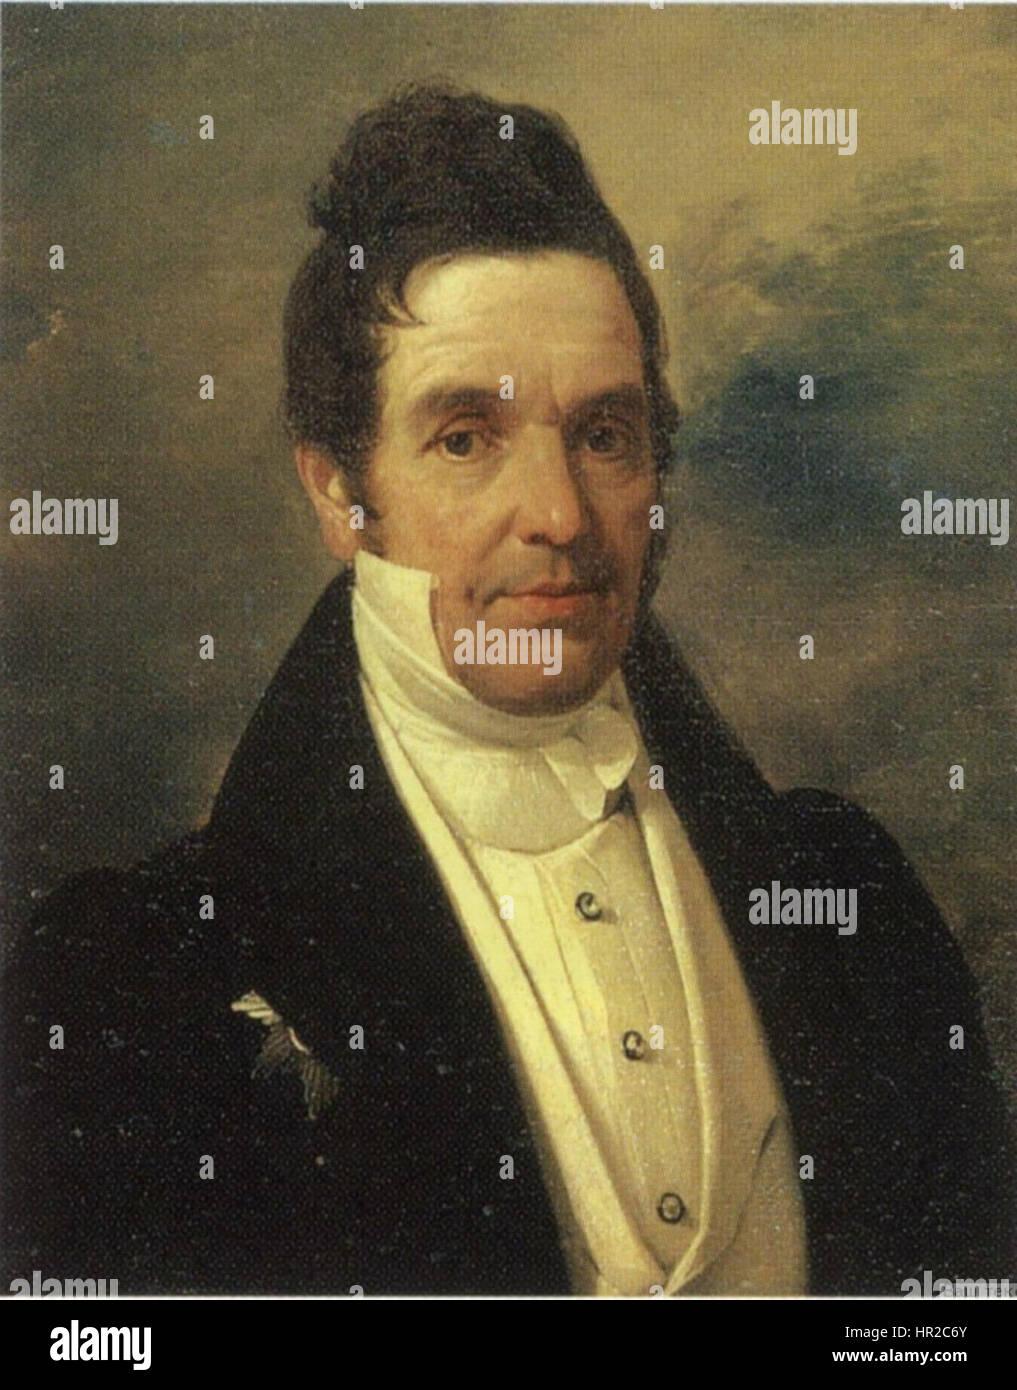 Portrait of Privy Councillor Timofei van der Flit - Stock Image